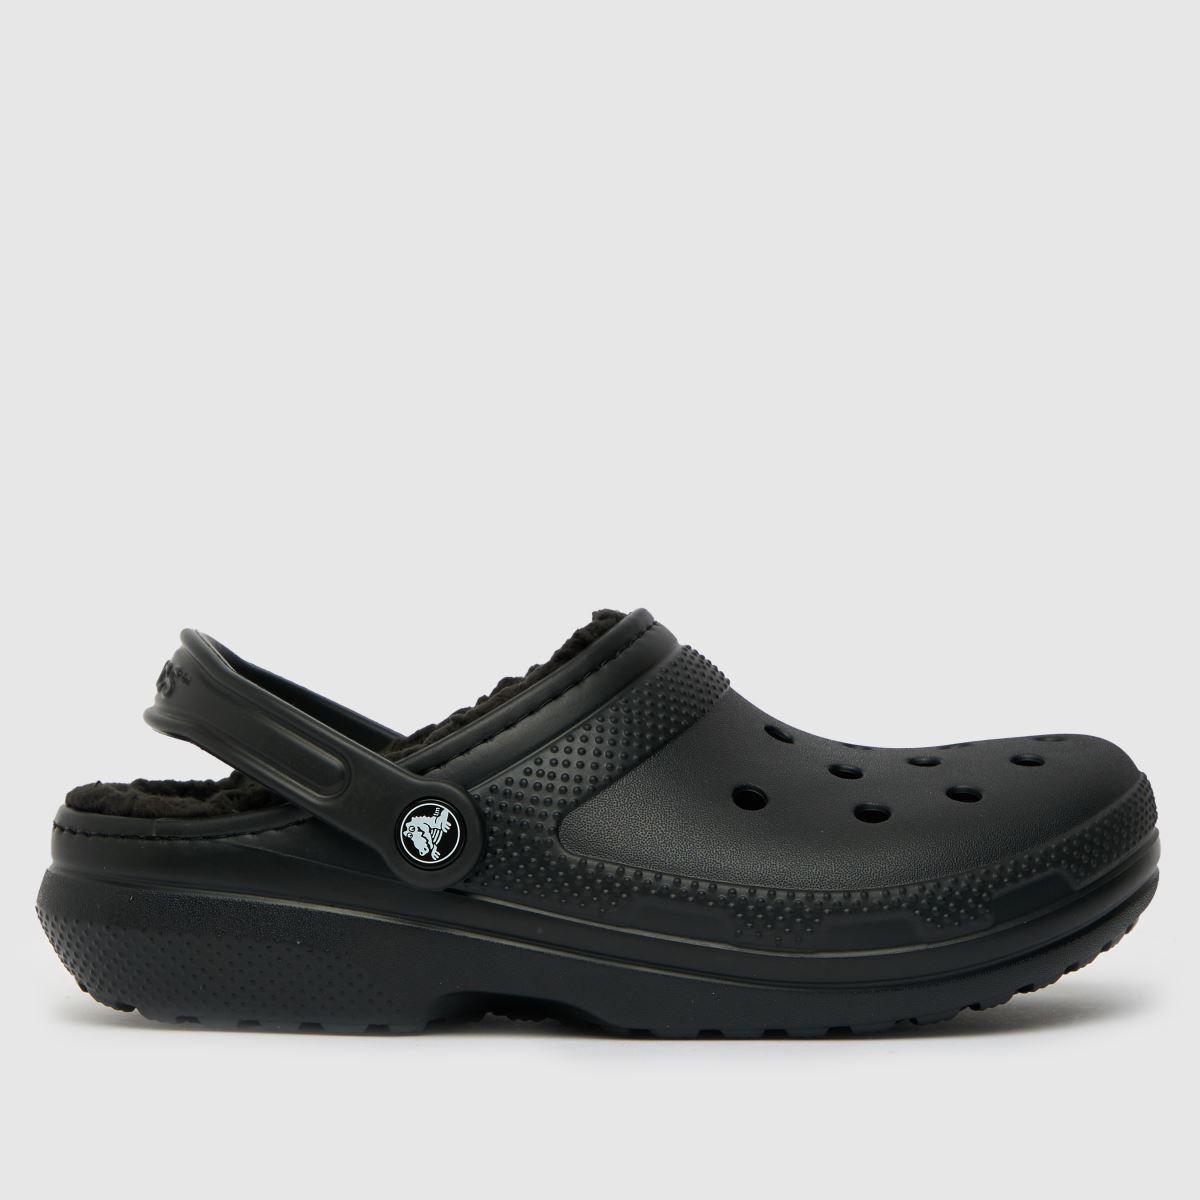 Crocs Black Warm Lined Clogs Sandals